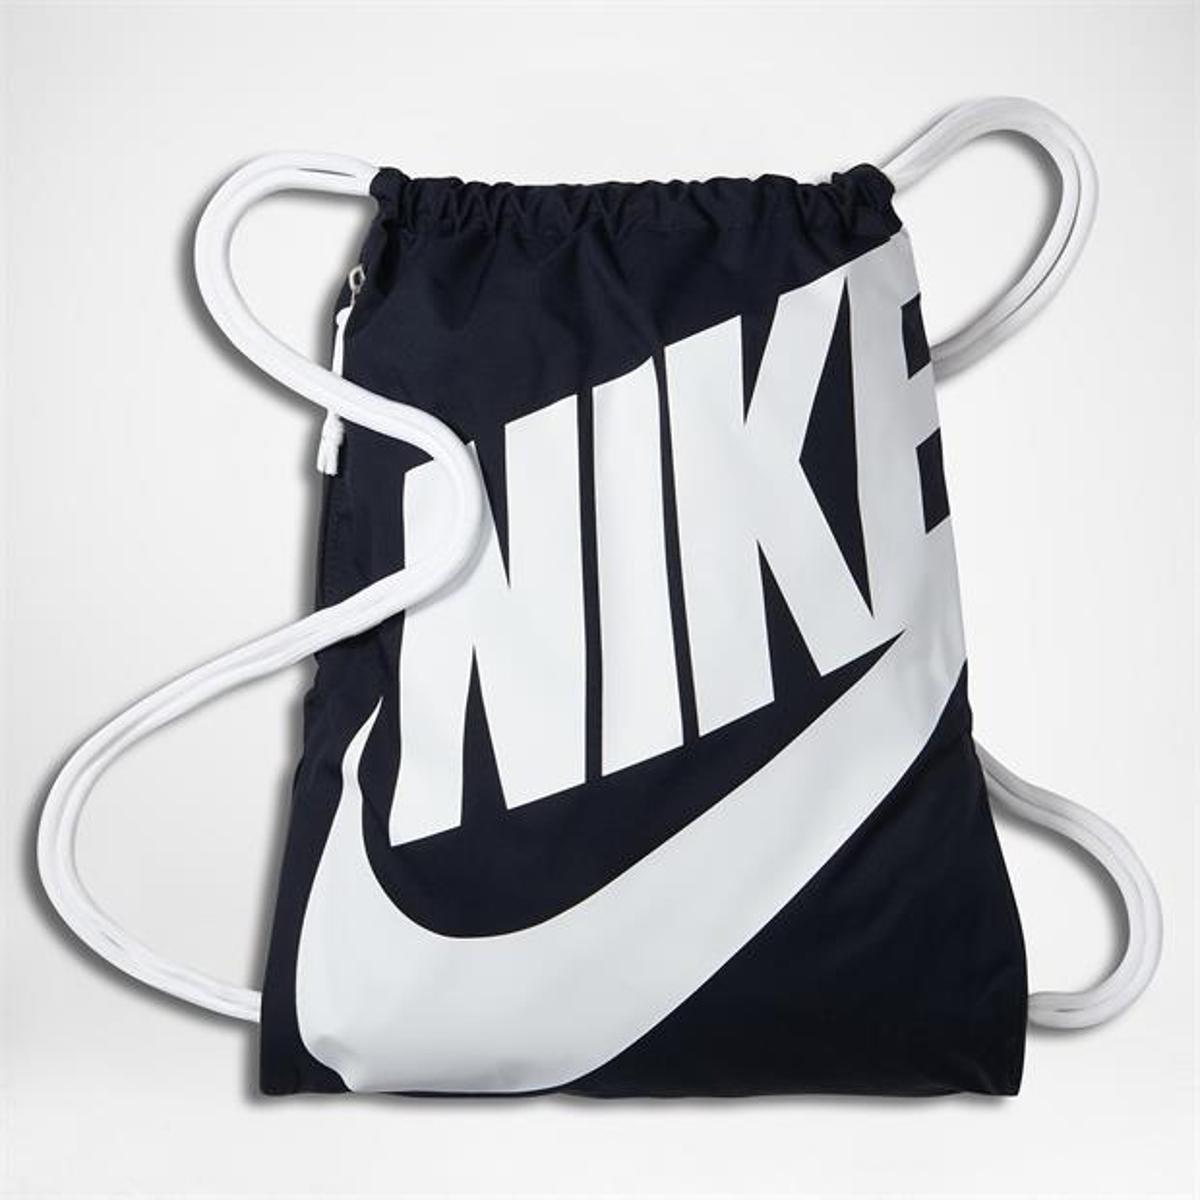 Heritage Azul Branco E Nike Gymsack Sacola zSVUpqM